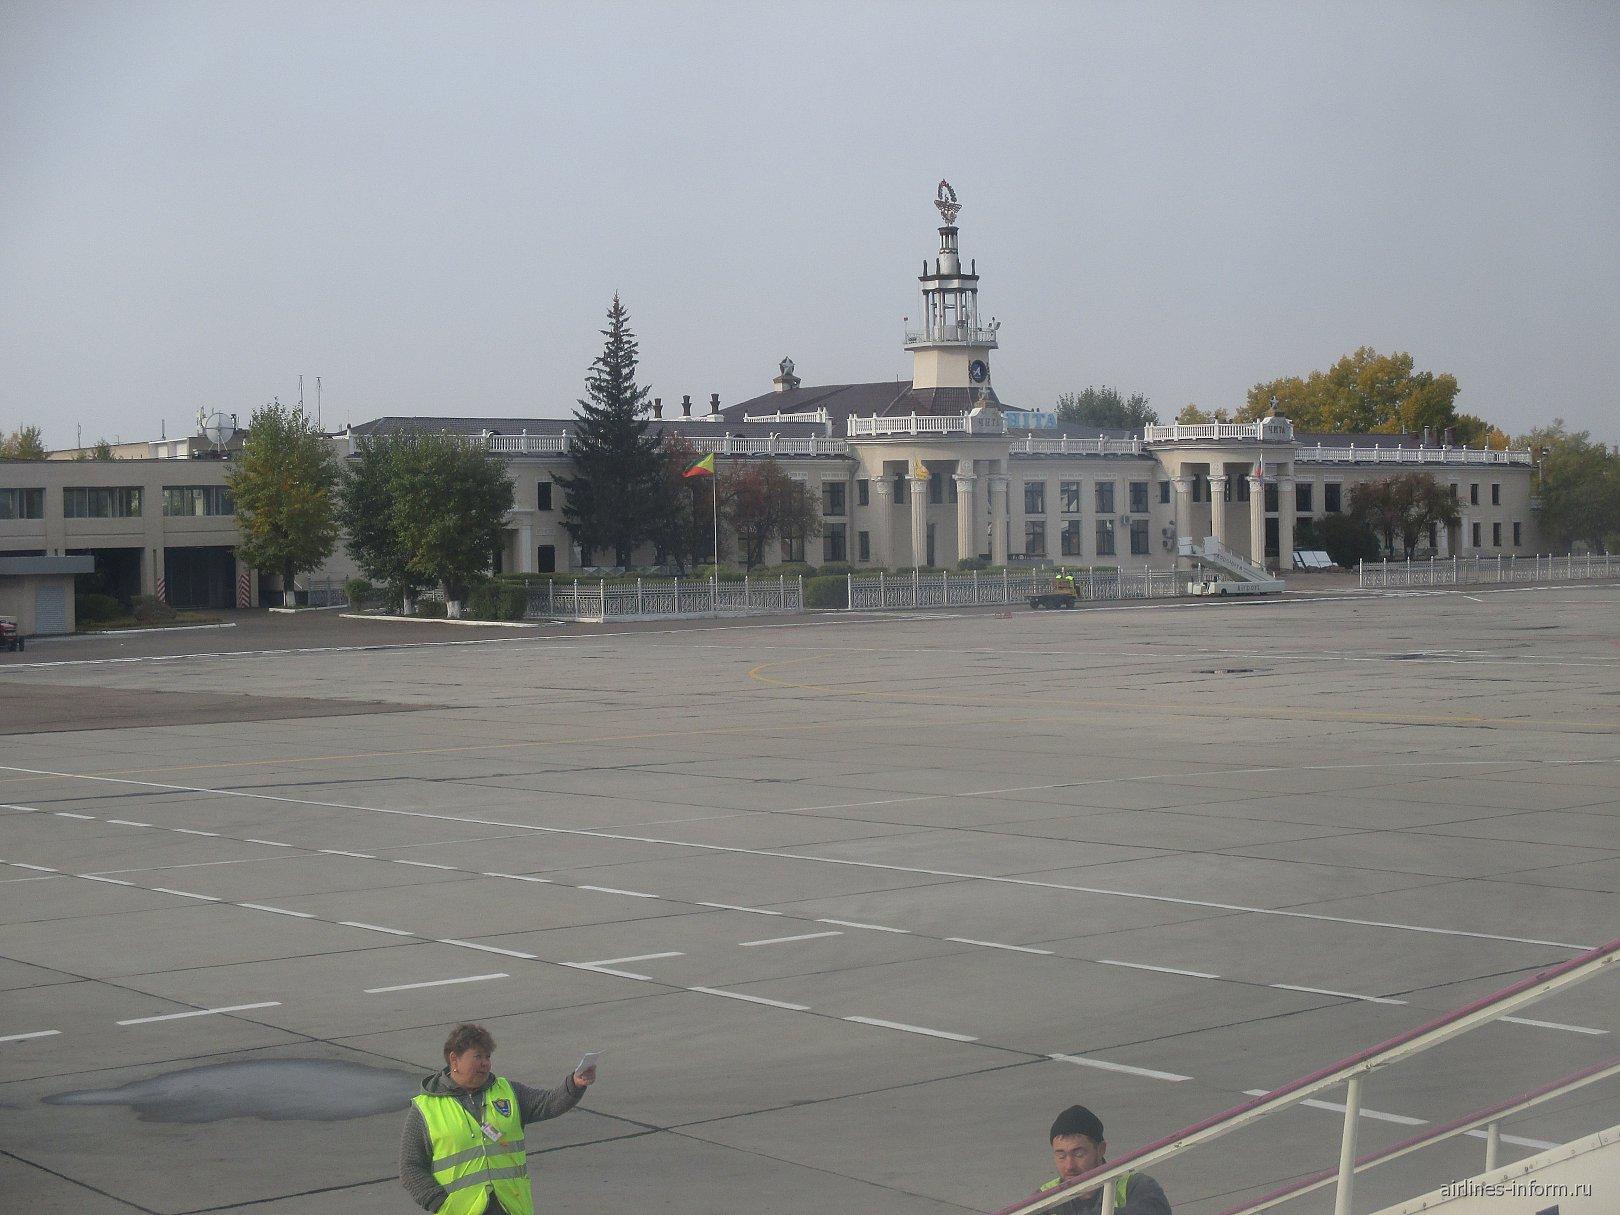 Аэровокзал международных линий аэропорта Чита Кадала